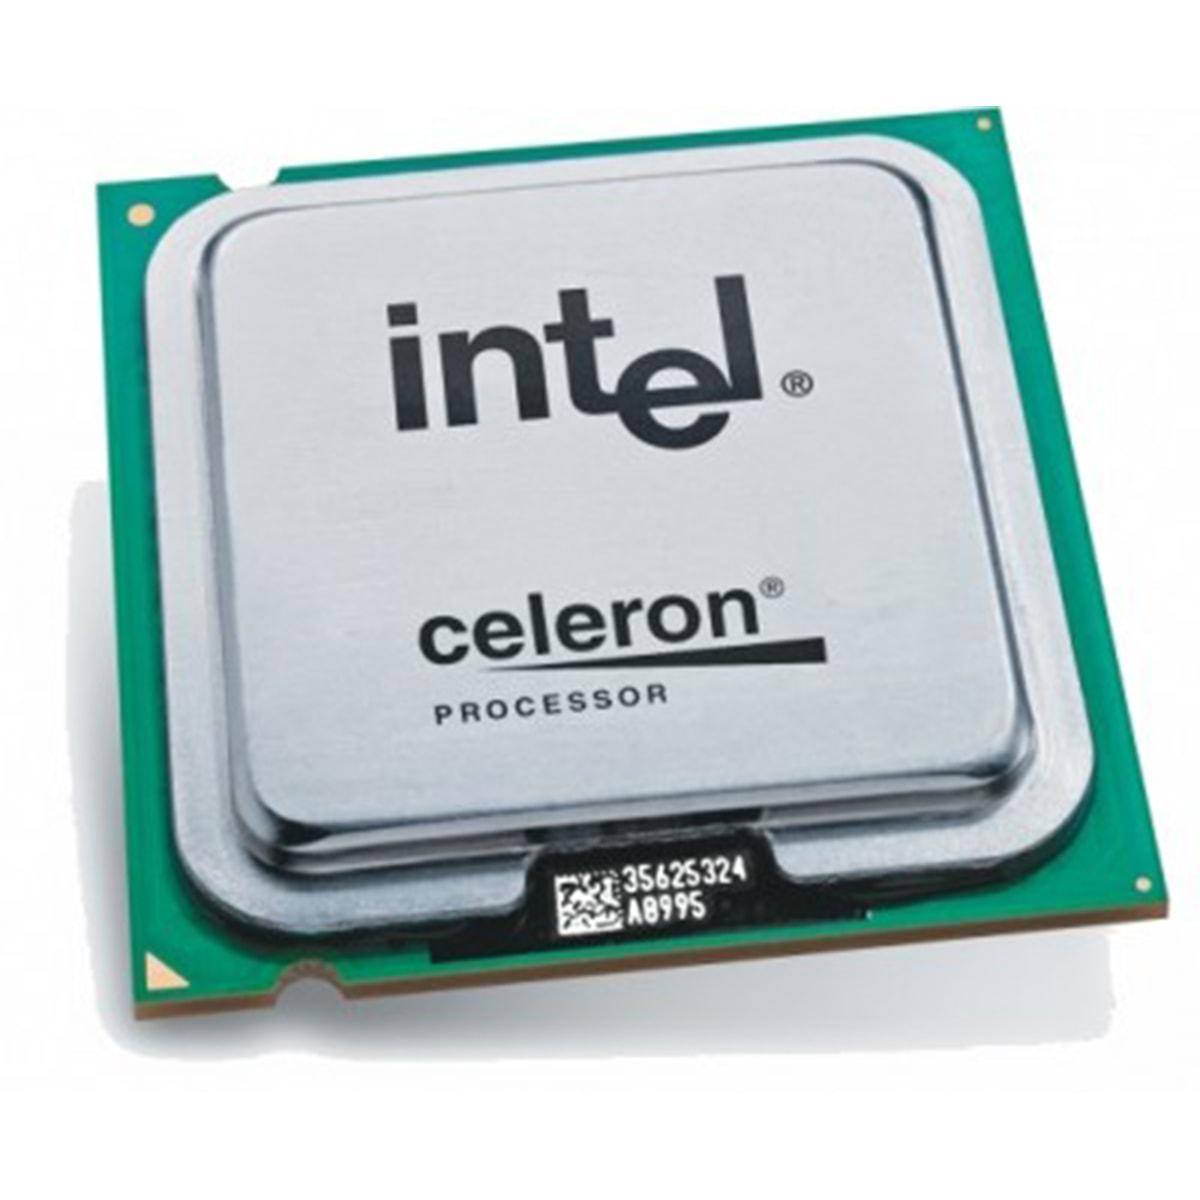 Processador Intel Celeron D 355 3,33Ghz 256Kb Cache 533MHz - Socket 775 - Seminovo